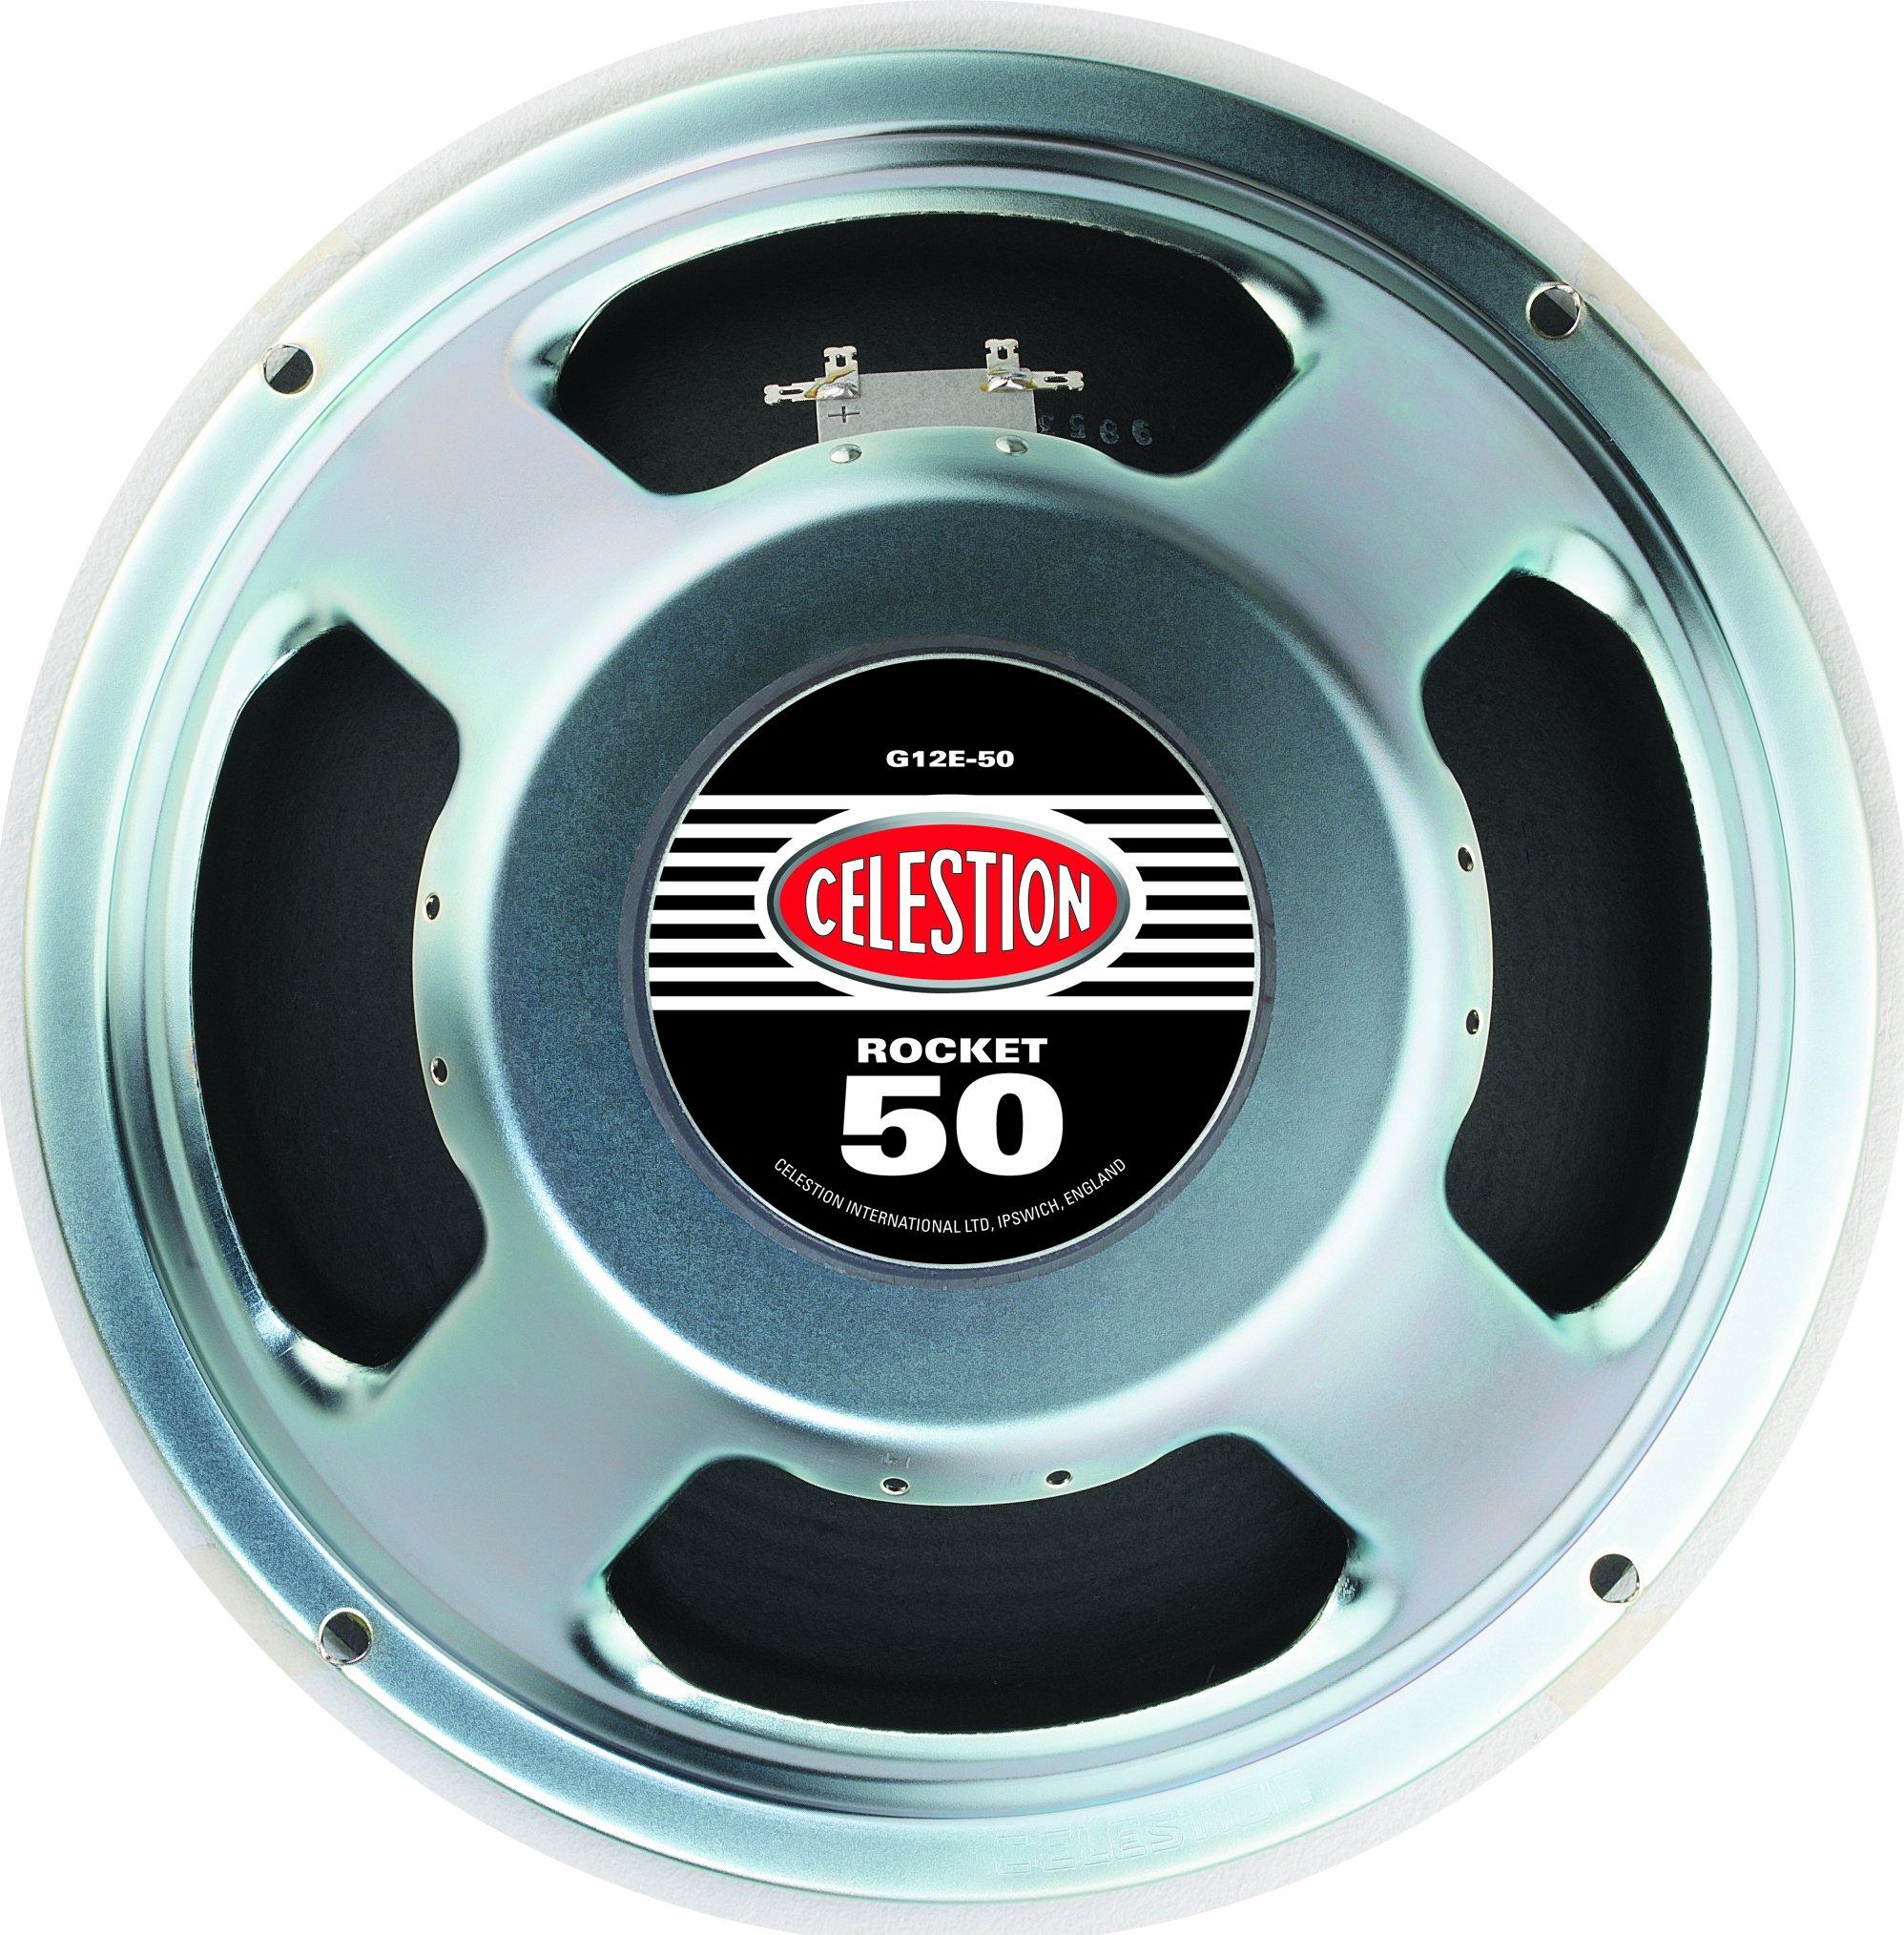 Celestion Rocket 50 Guitar Speaker, 8 Ohm